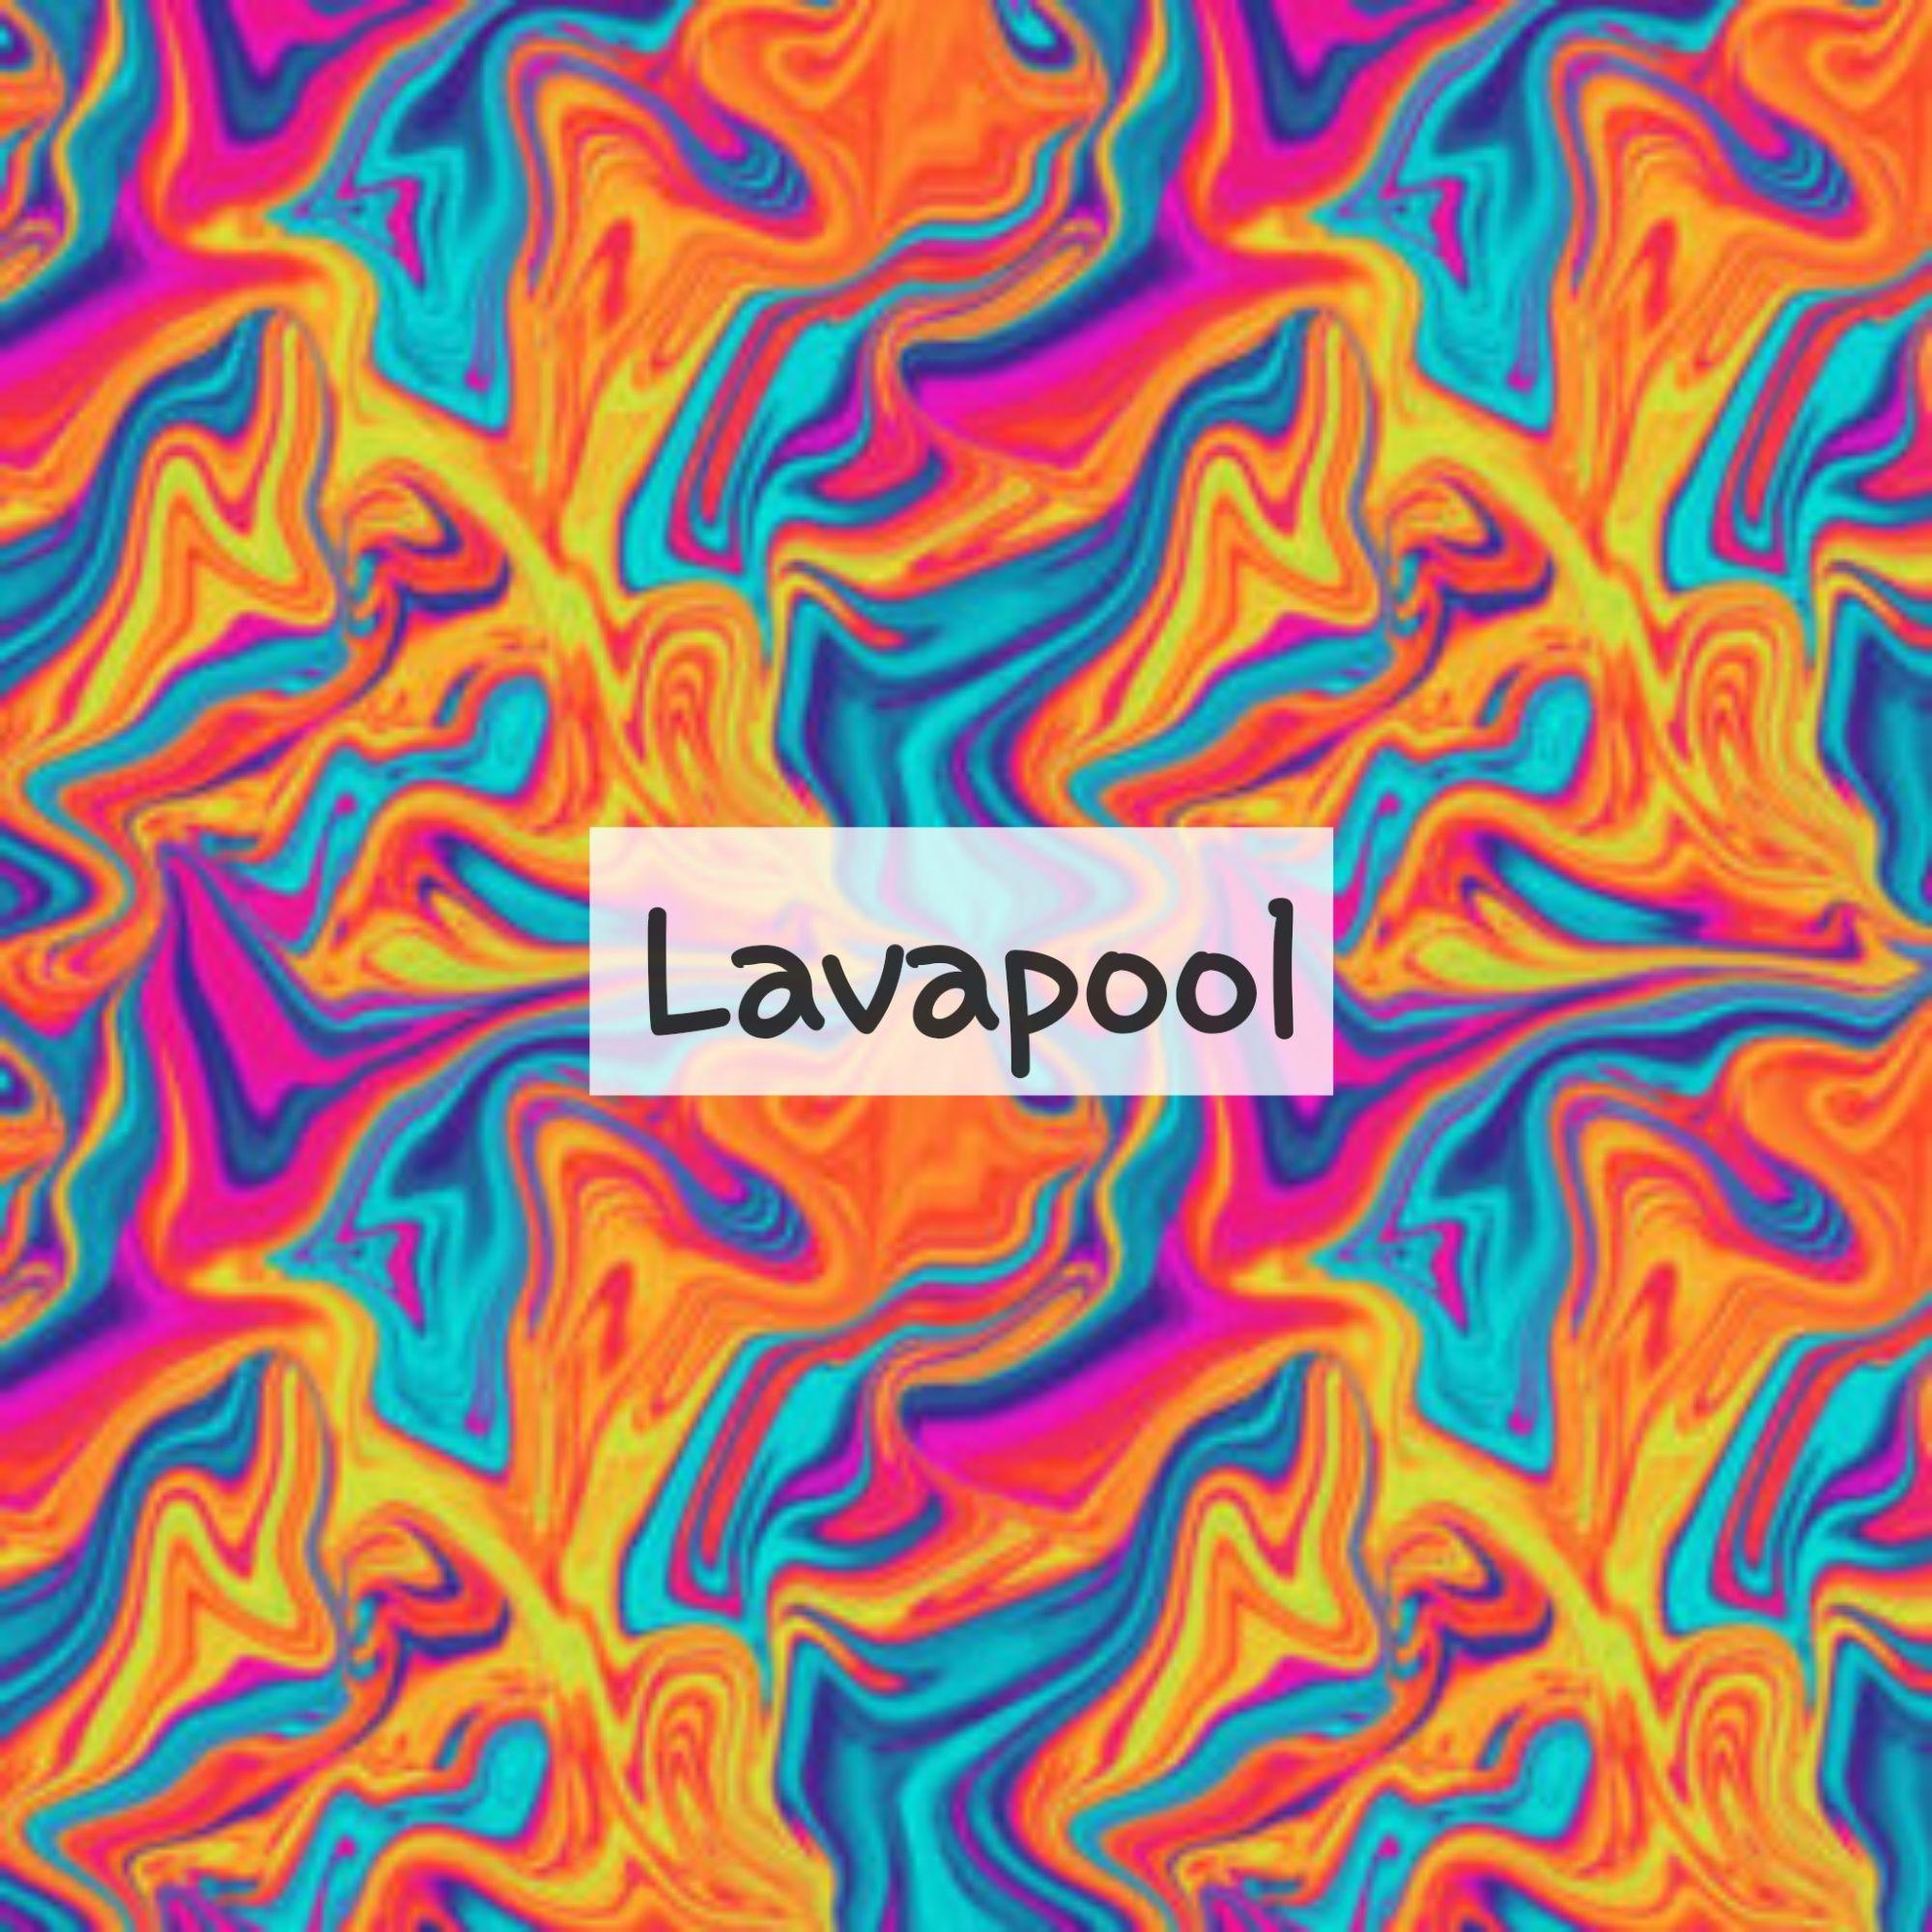 Lavapool